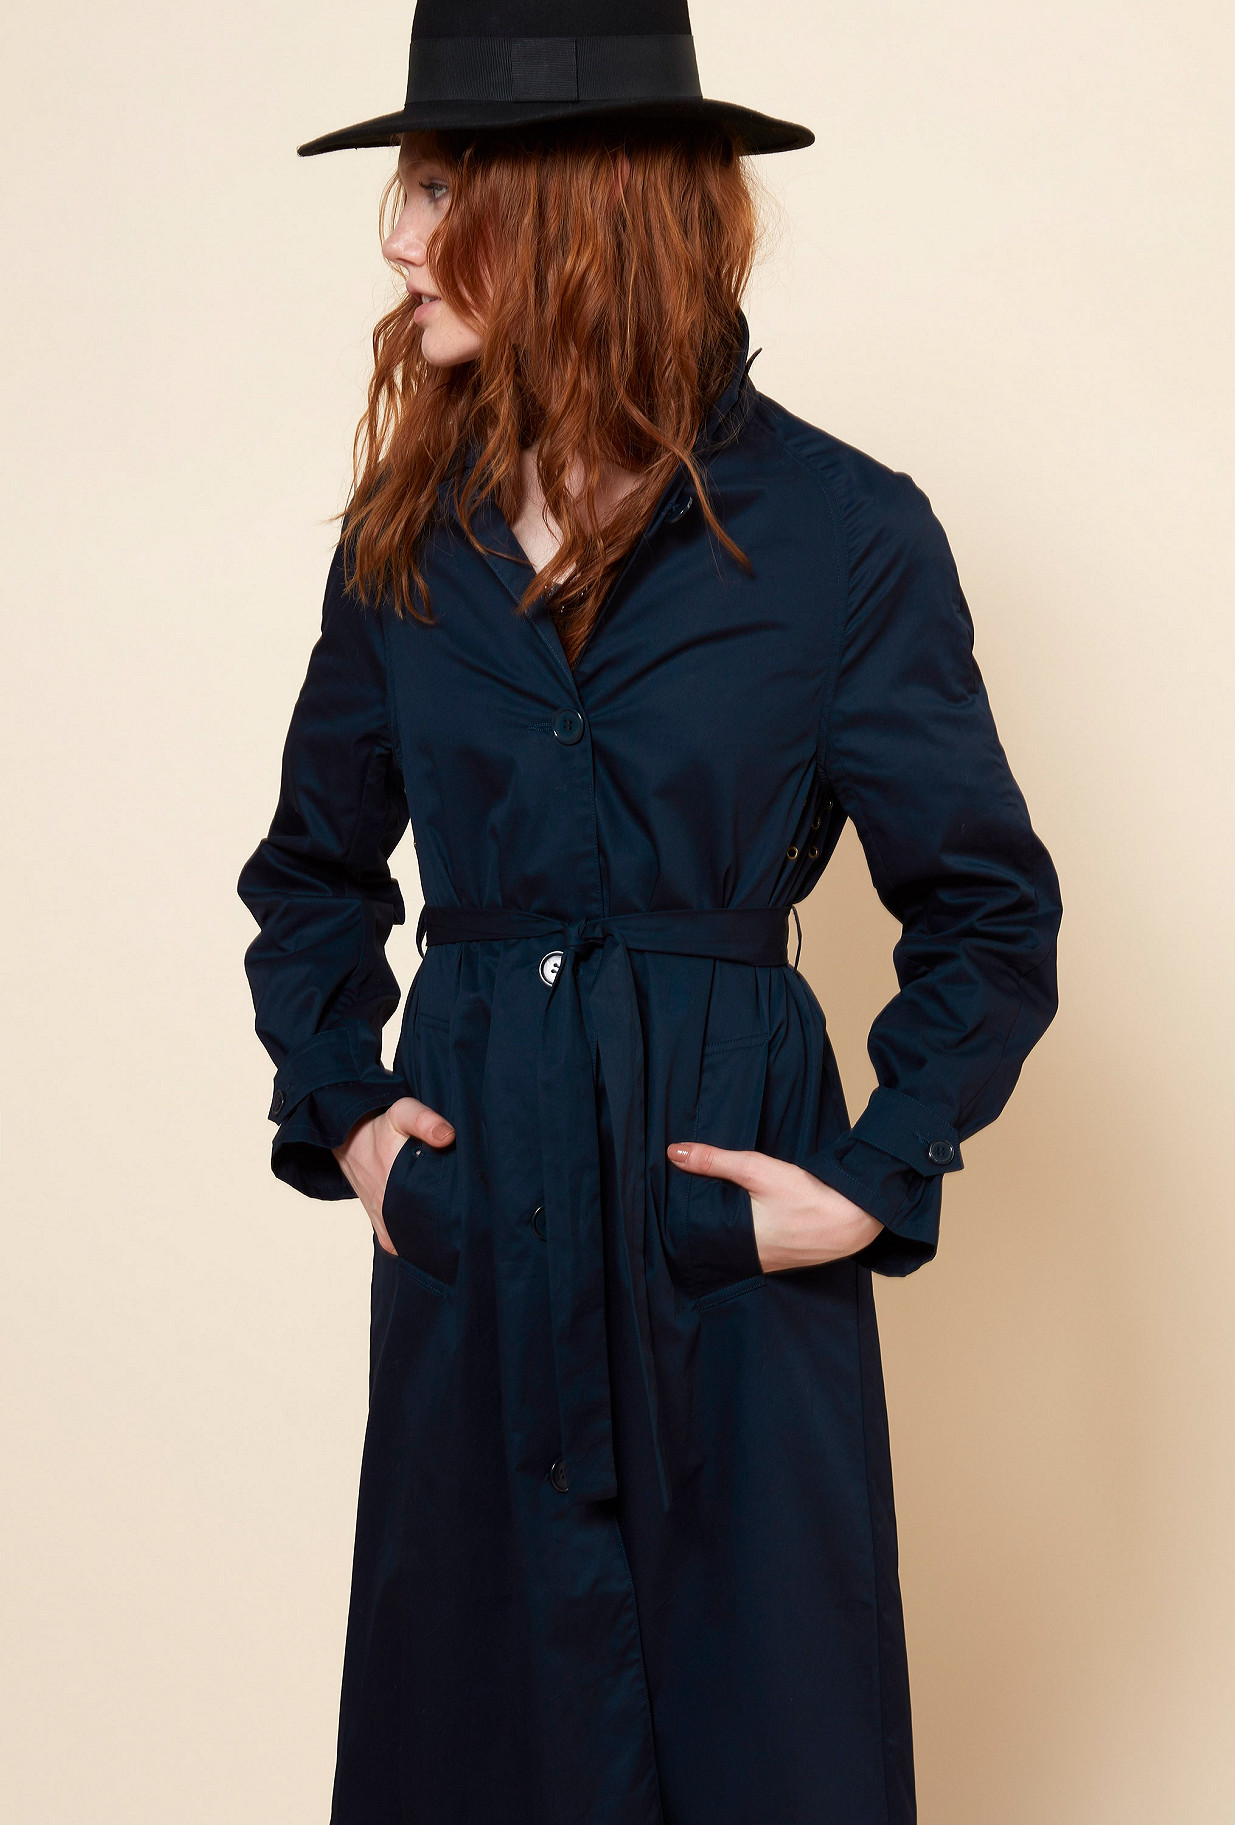 Navy COAT Grant Mes Demoiselles Paris